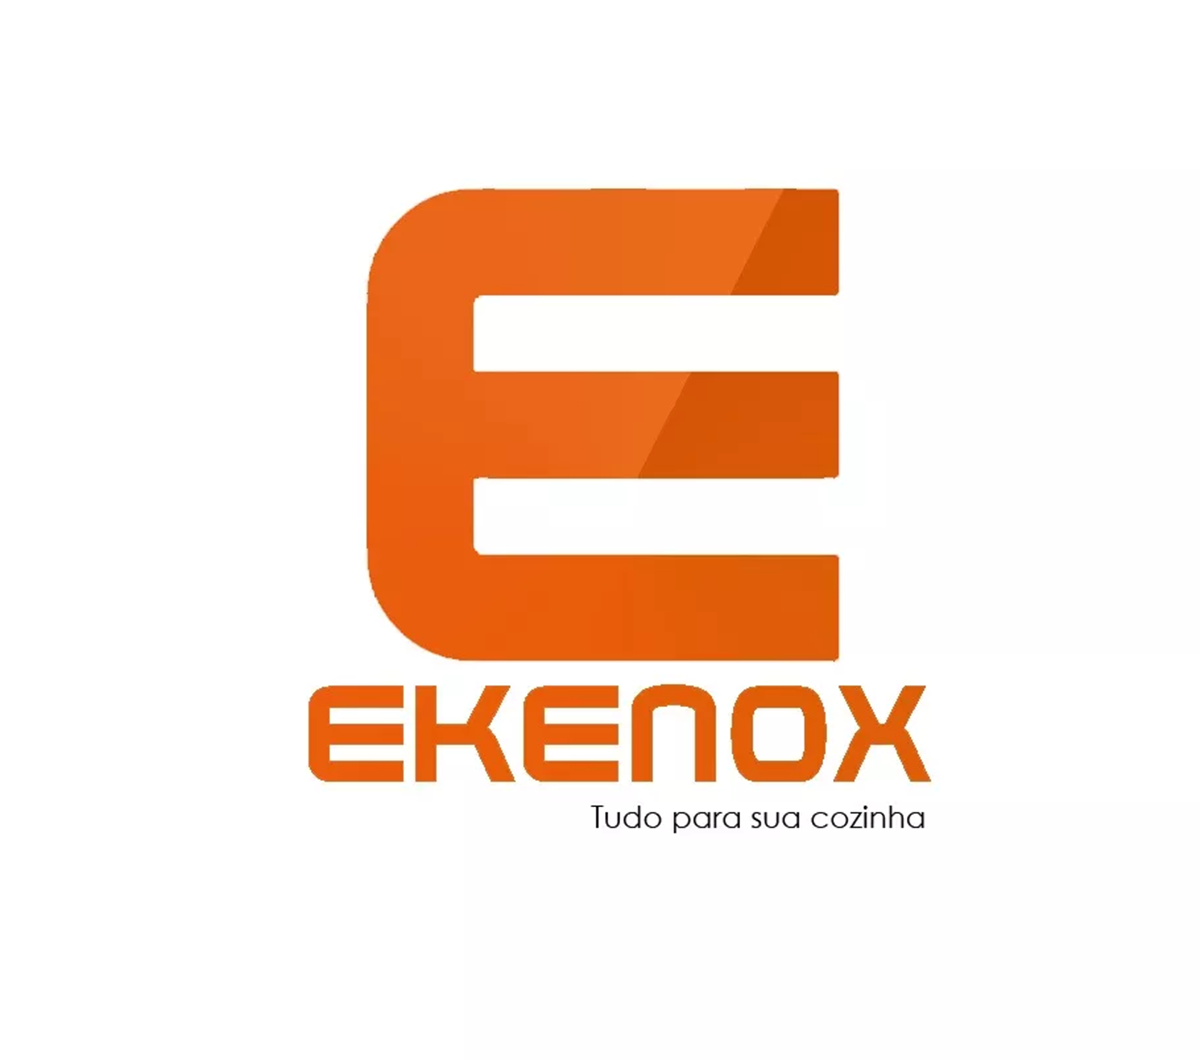 Kit 2 Porta Moedas de Peruero  - EKENOX- Equipamentos Industriais